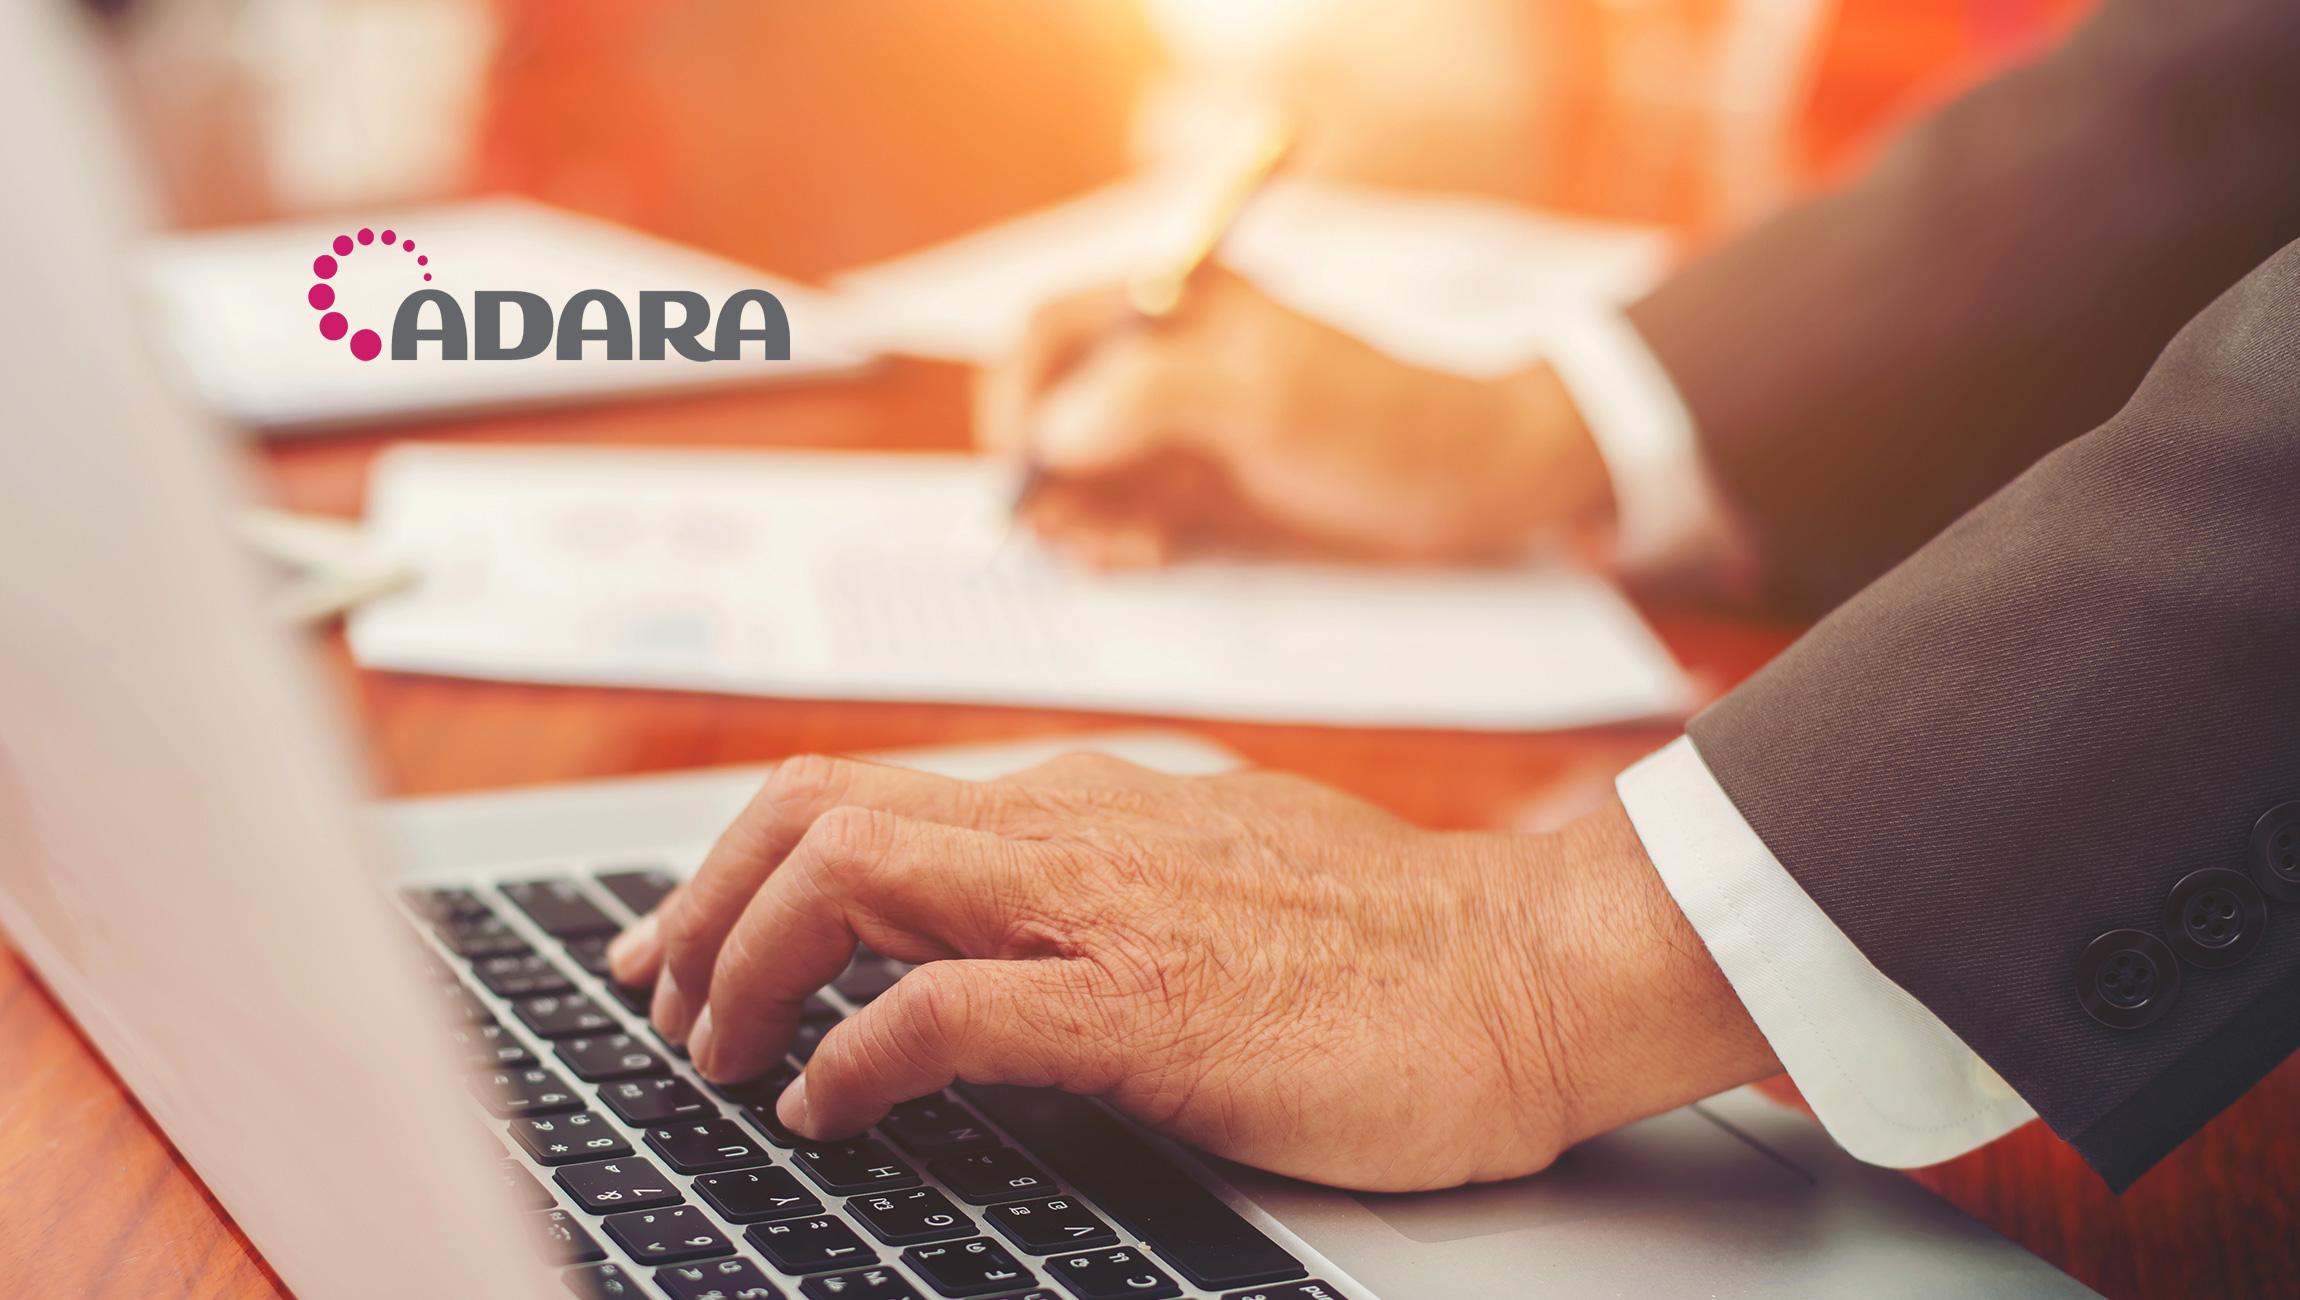 ADARA Names Steve Melamed as Chief Revenue Officer 1